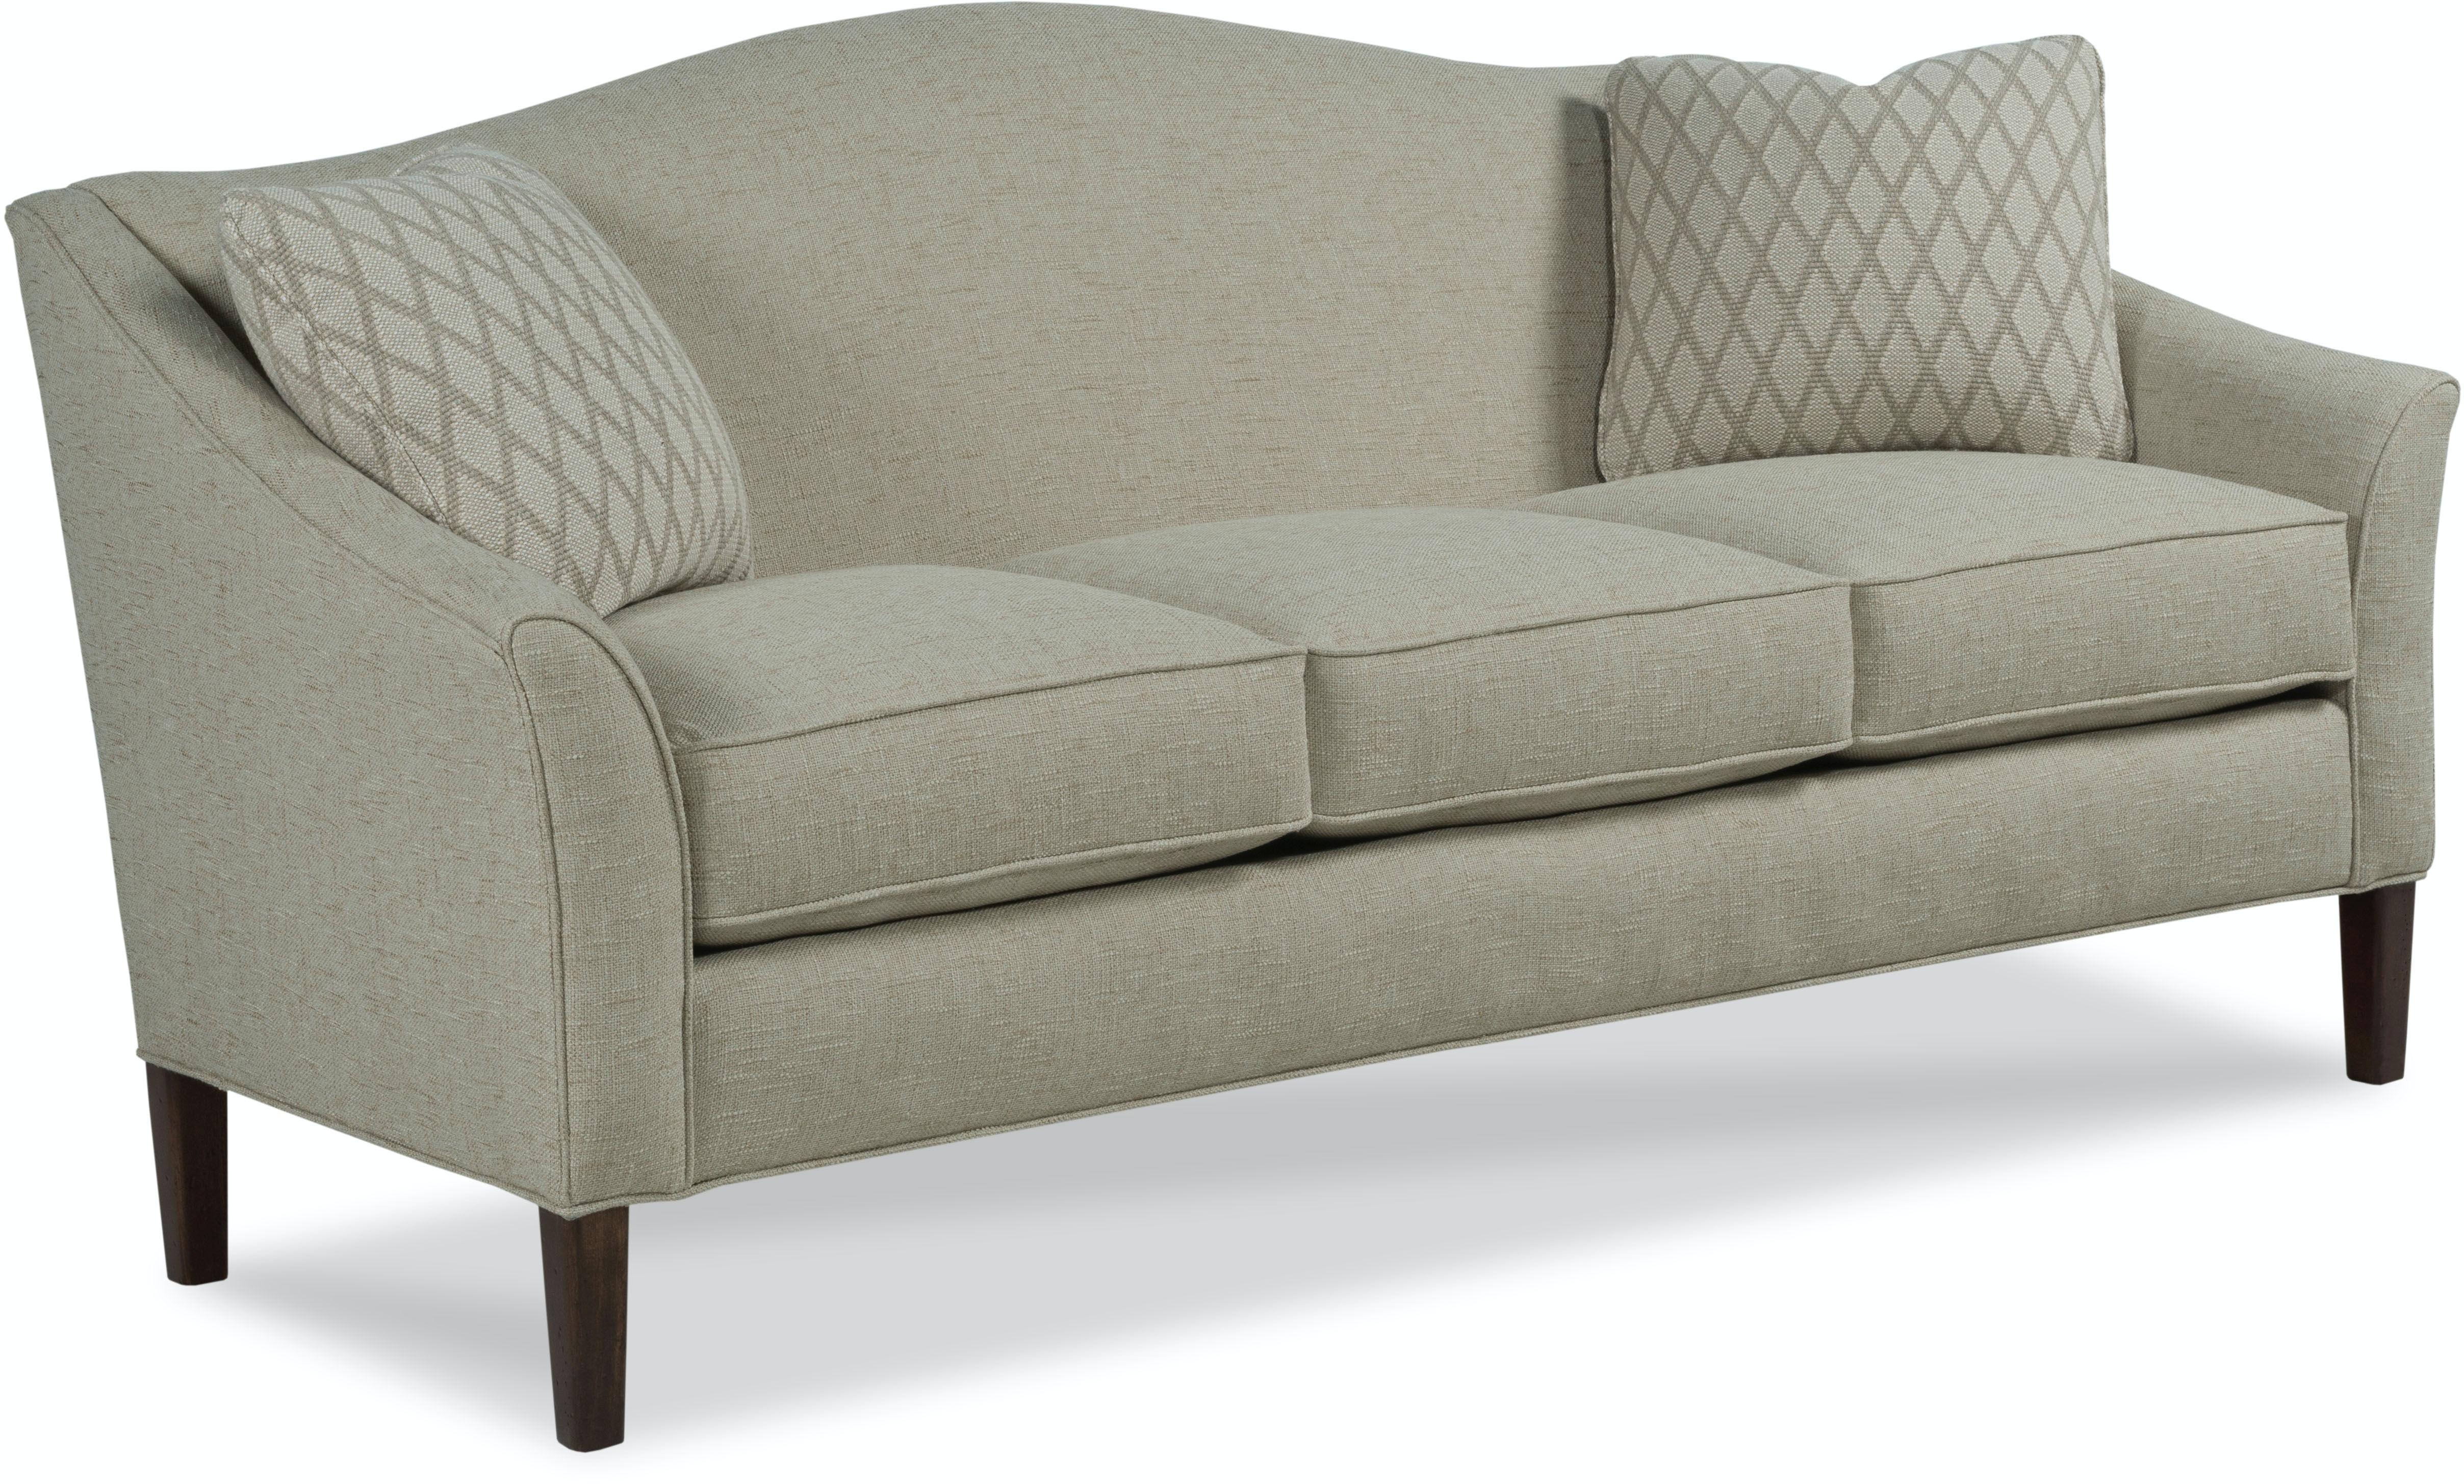 Fairfield Chair pany Living Room Sofa 2710 50